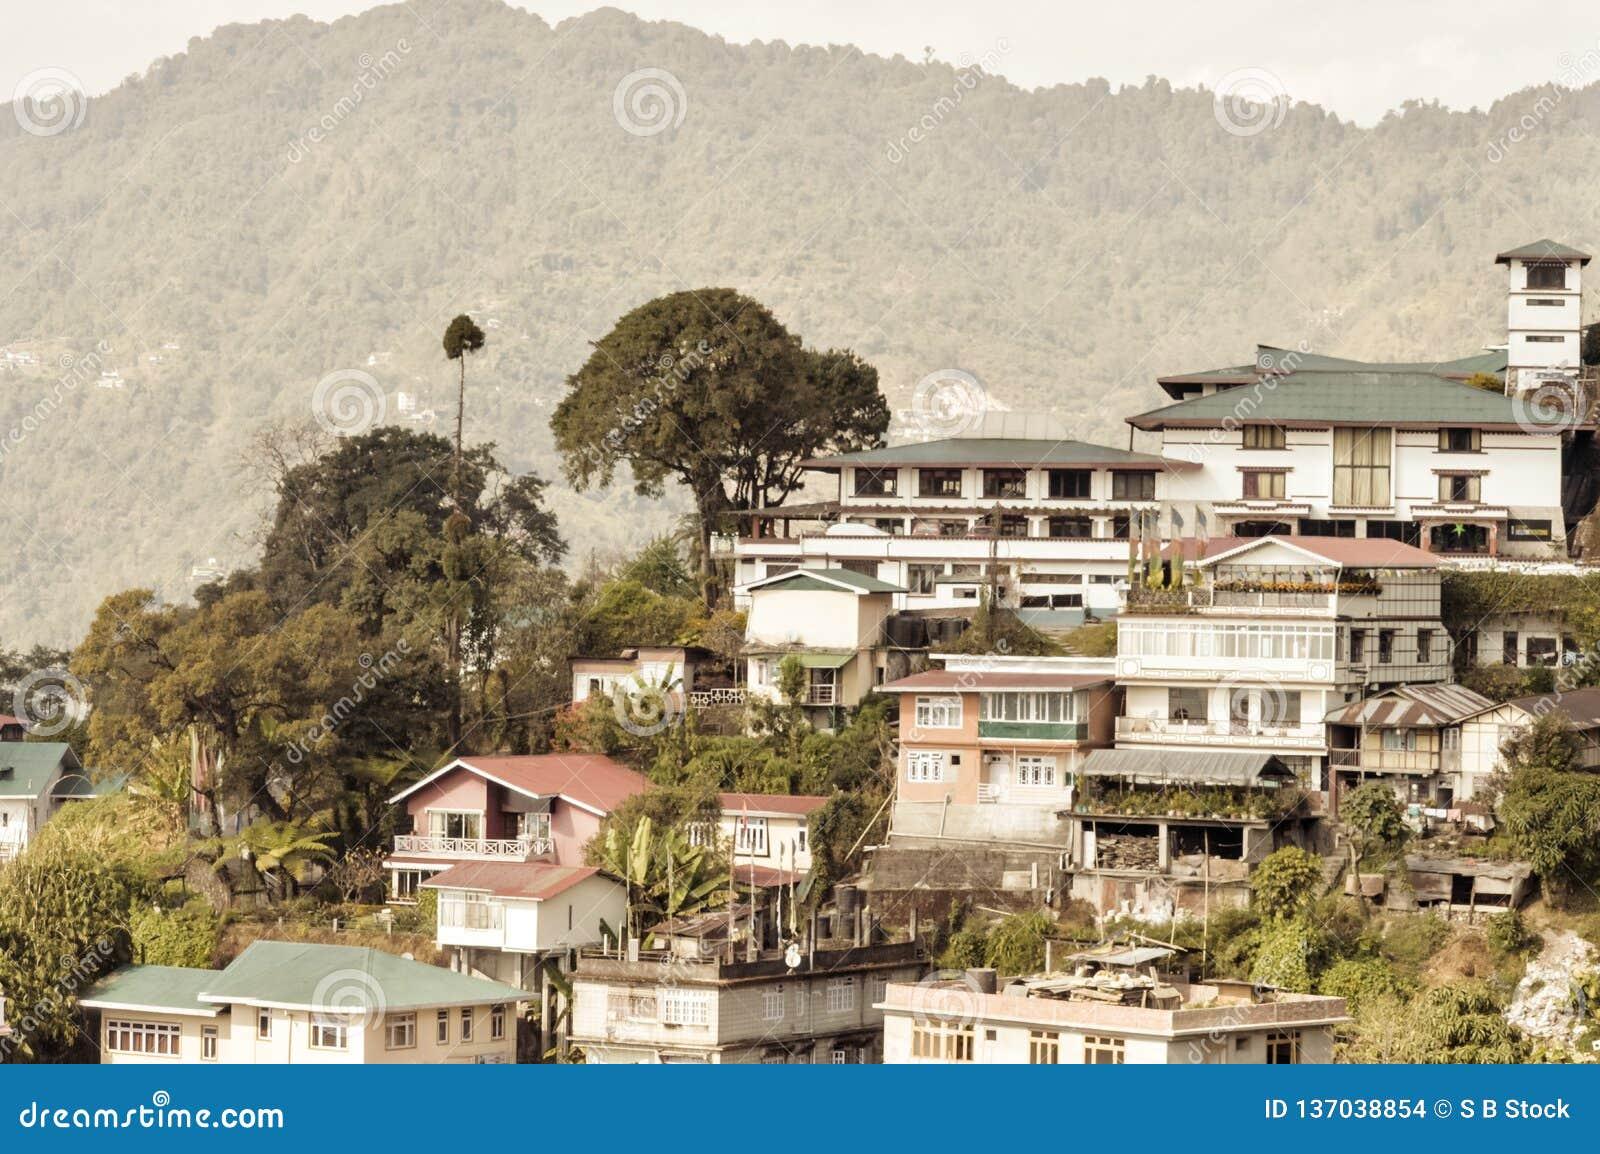 Opinião bonita do panorama da cidade de Gangtok, a cidade a maior do estado indiano de Sikkim, situado na escala Himalaia orienta